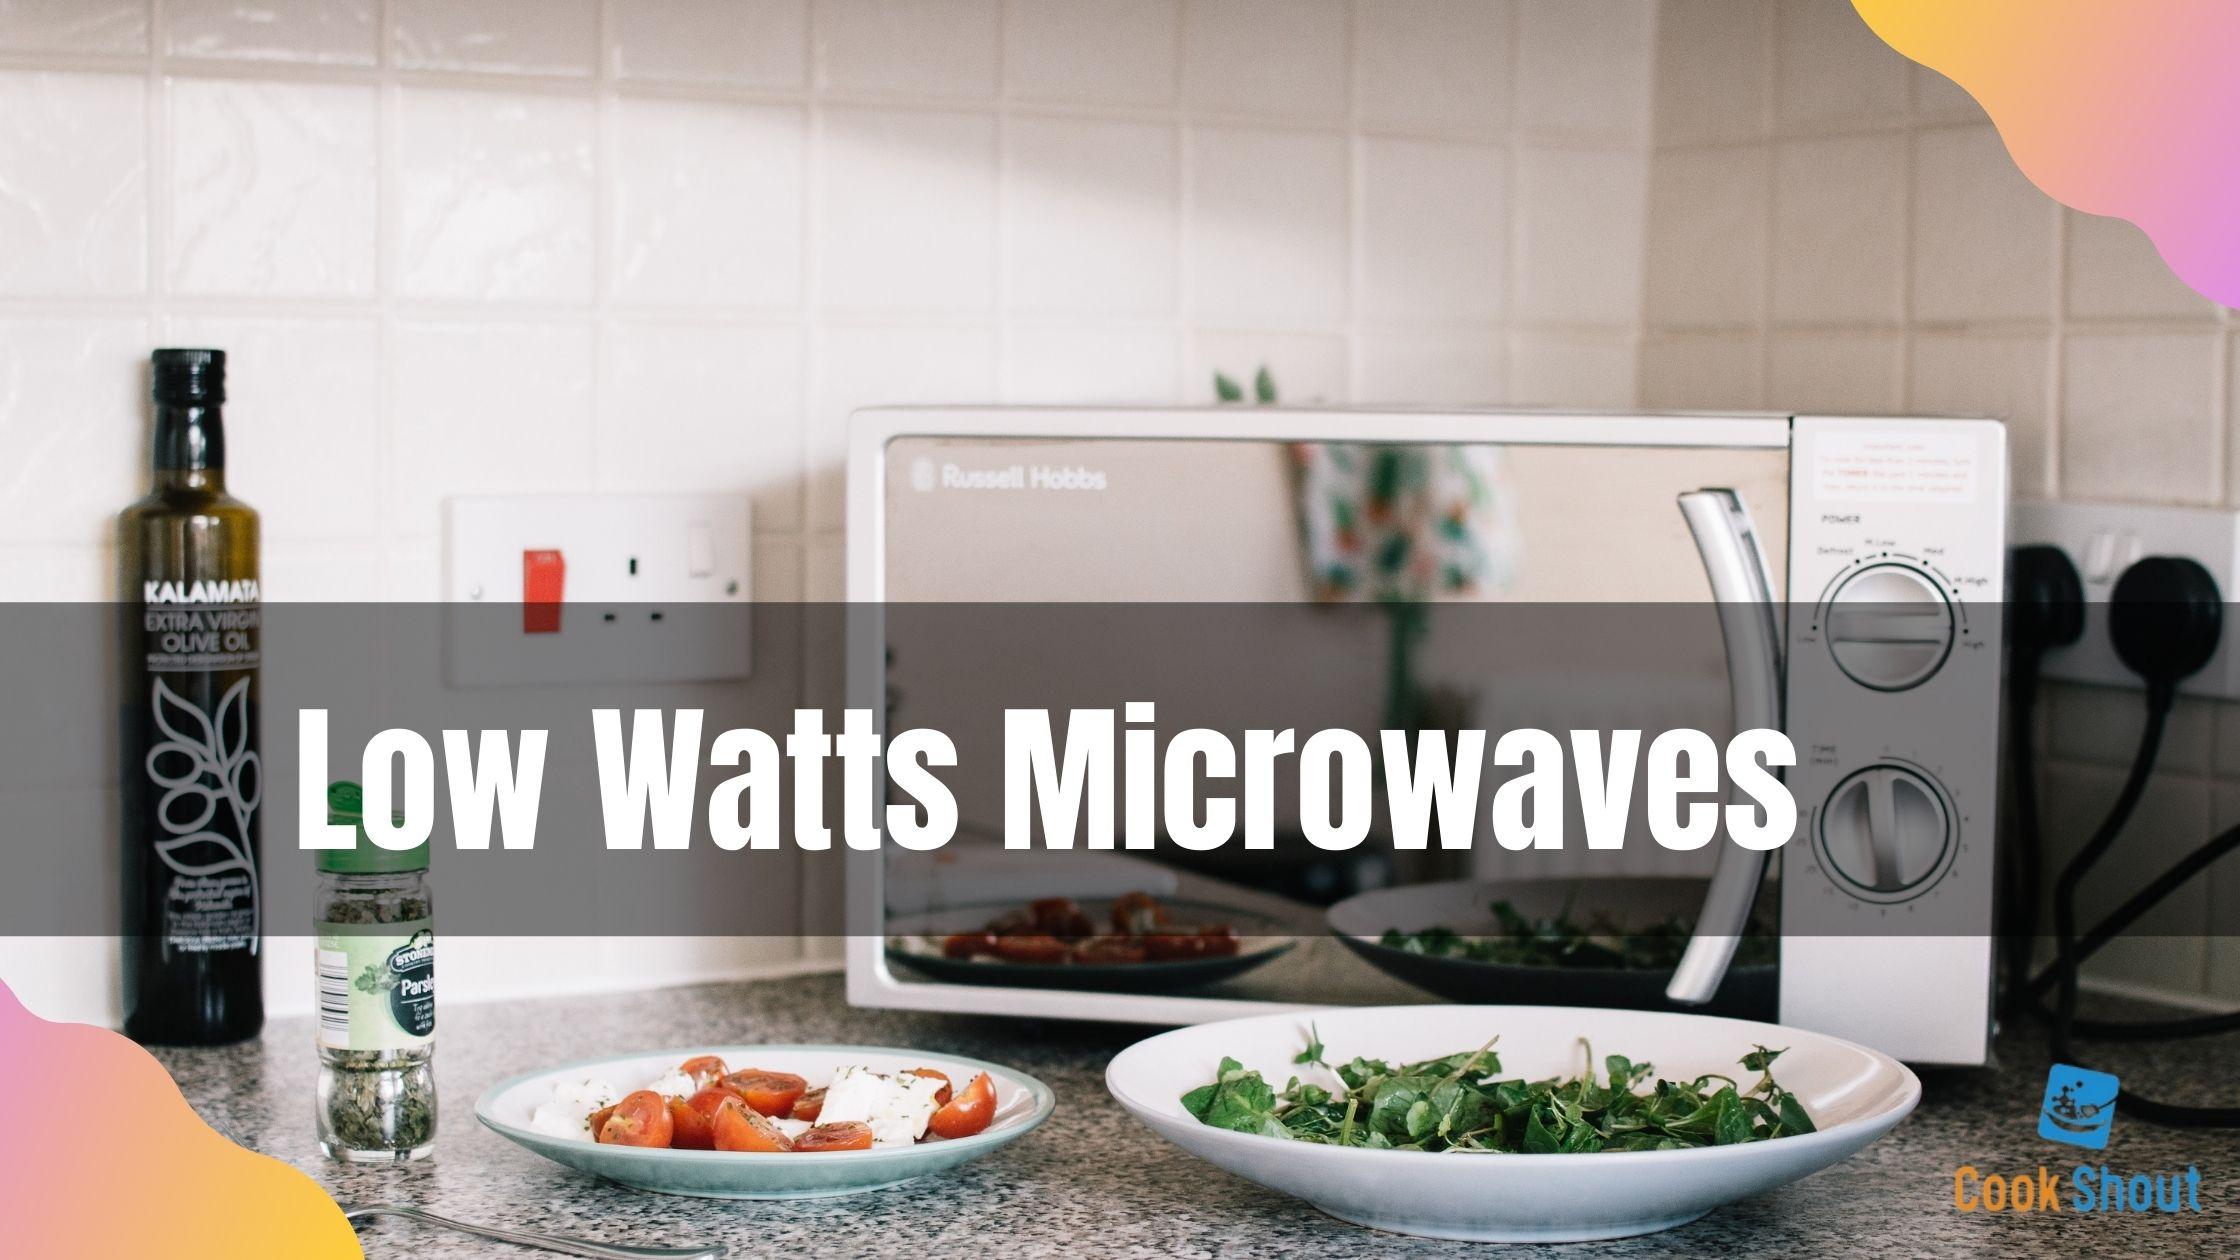 Low Watts Microwaves 2021